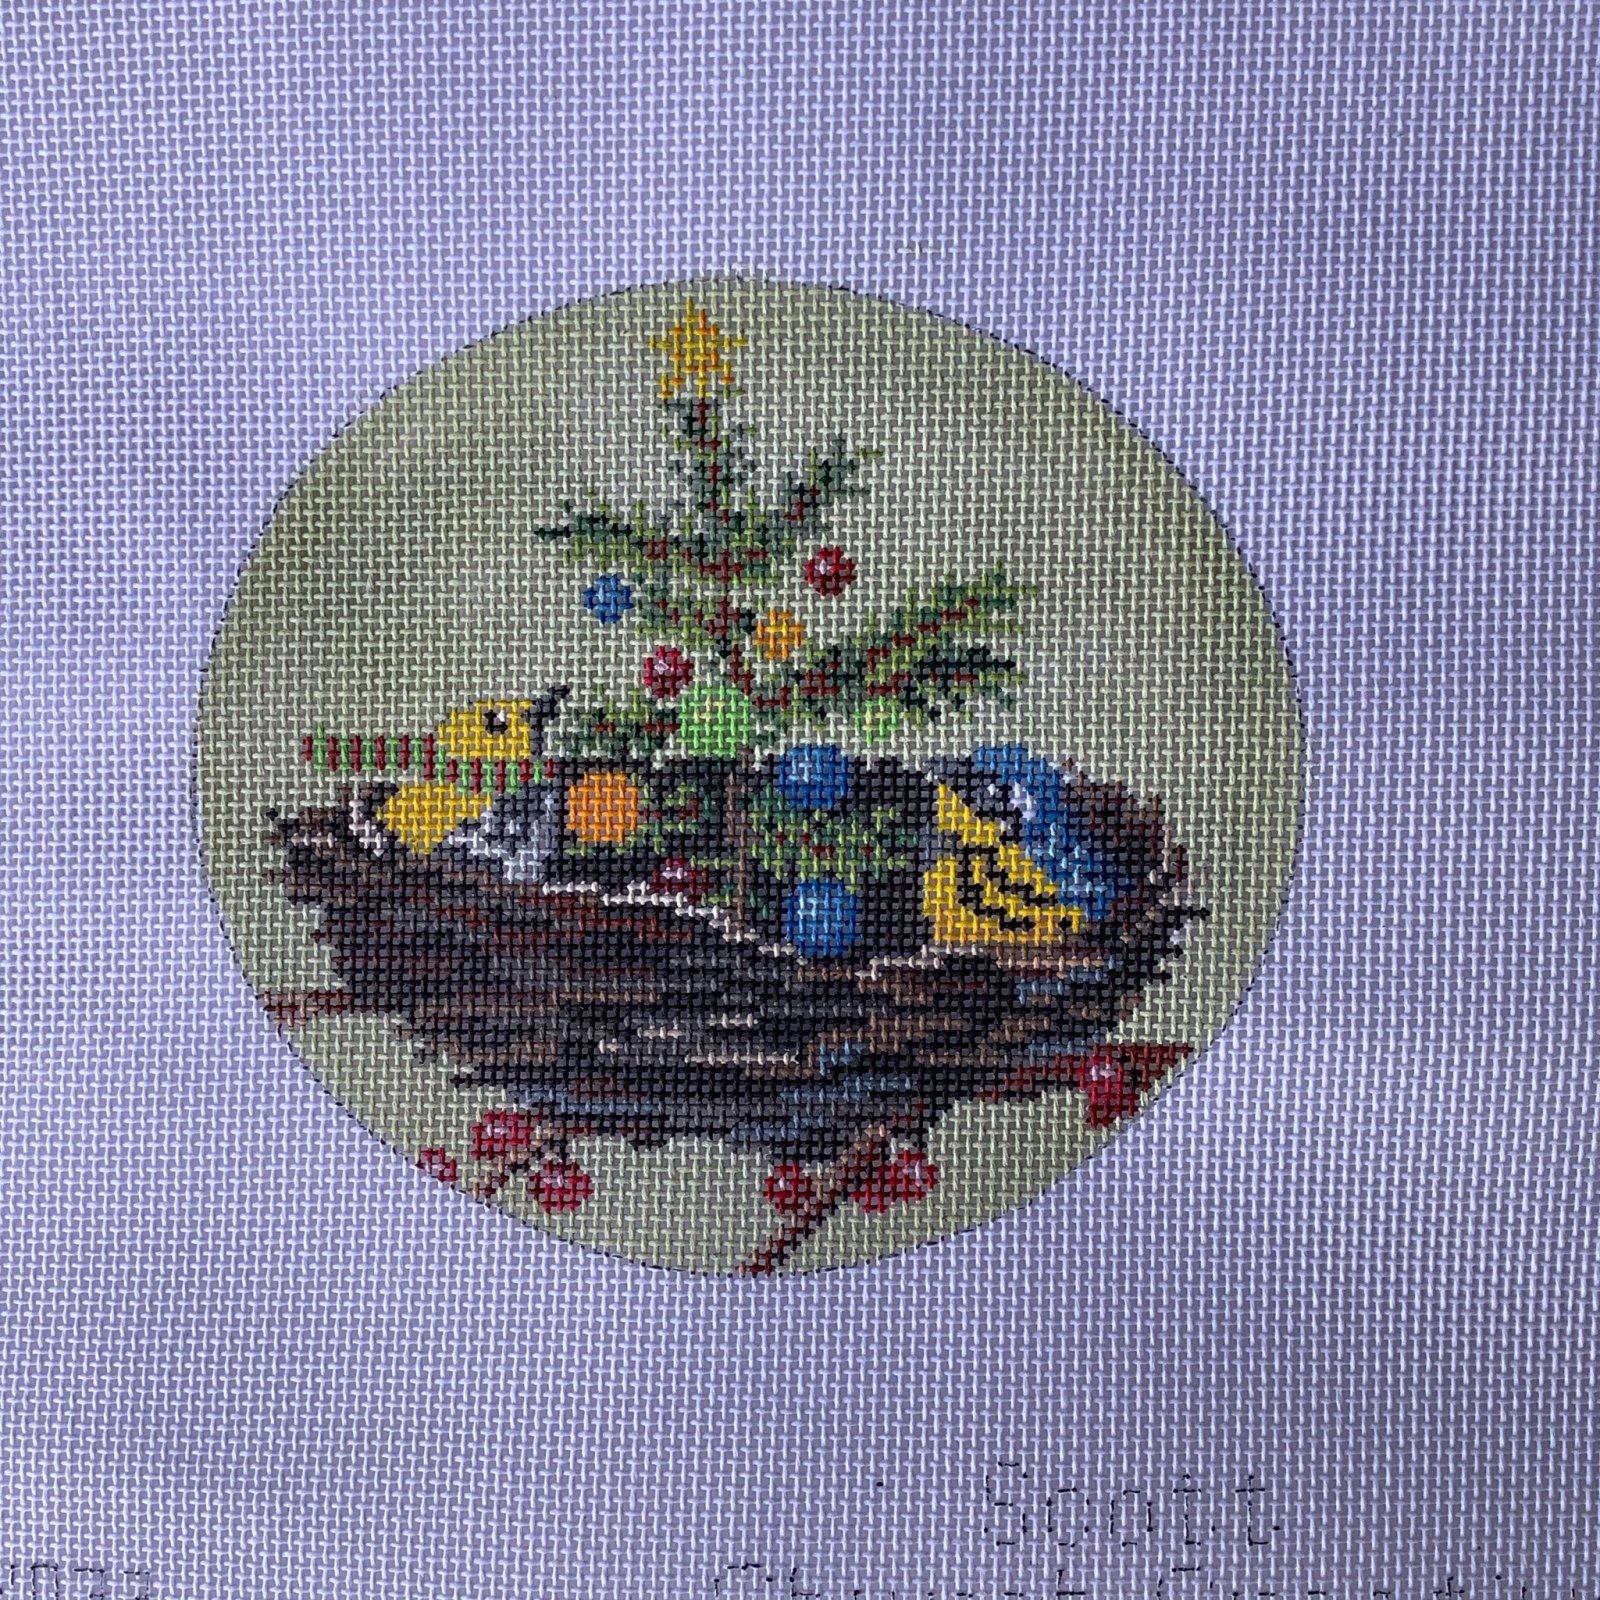 SCXO33 Christmas in the Nest Ornament